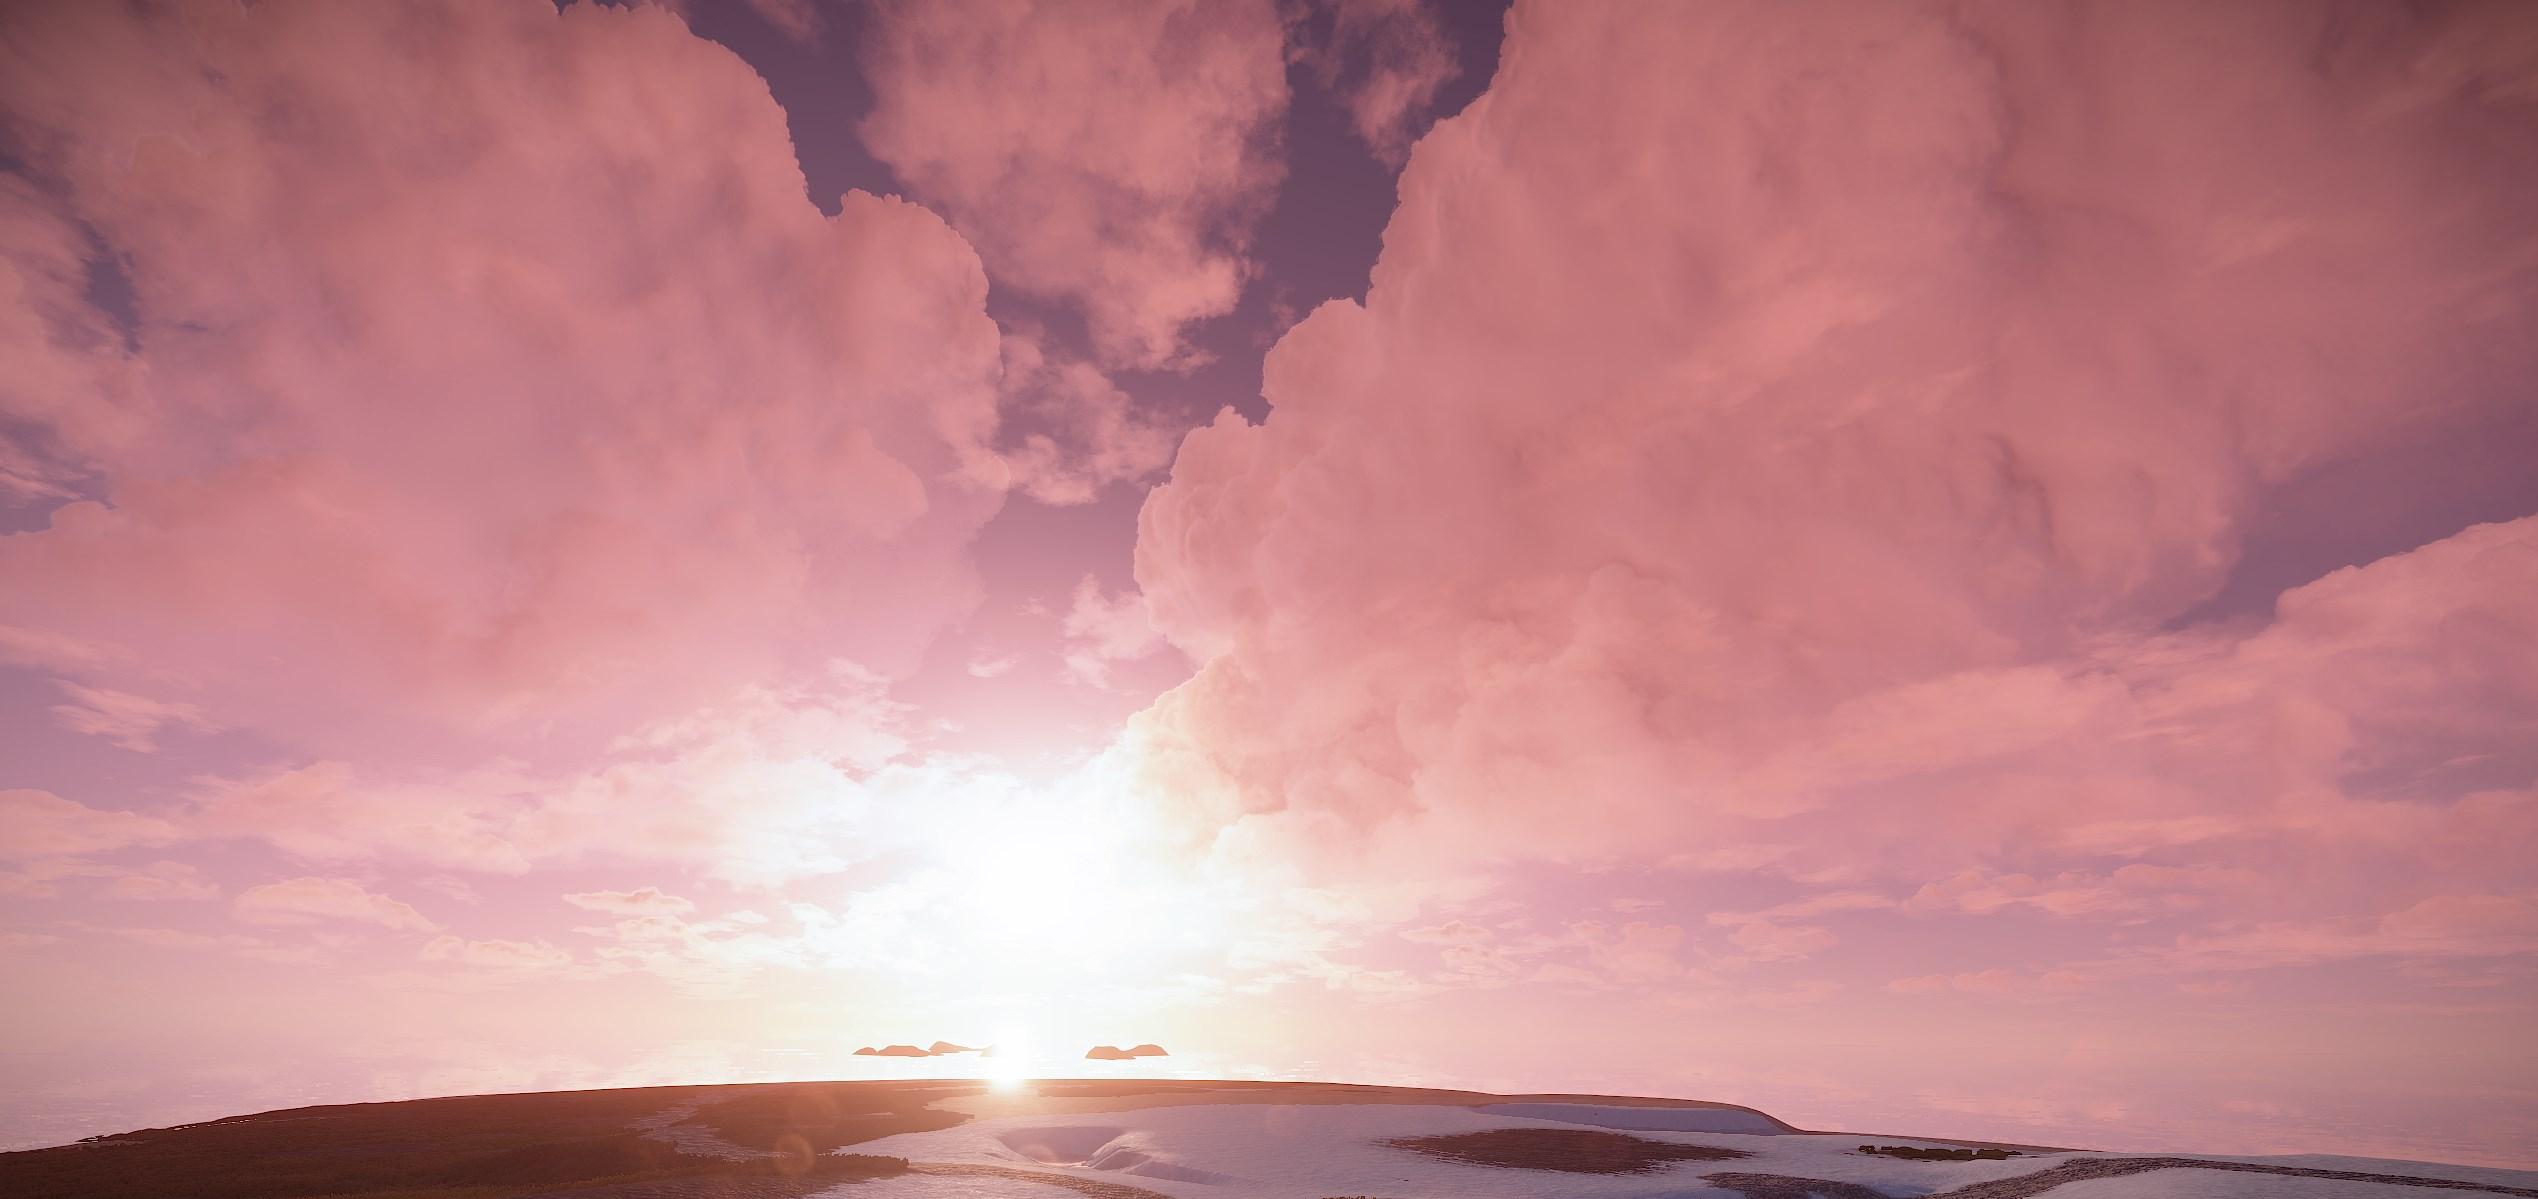 картинка sky1